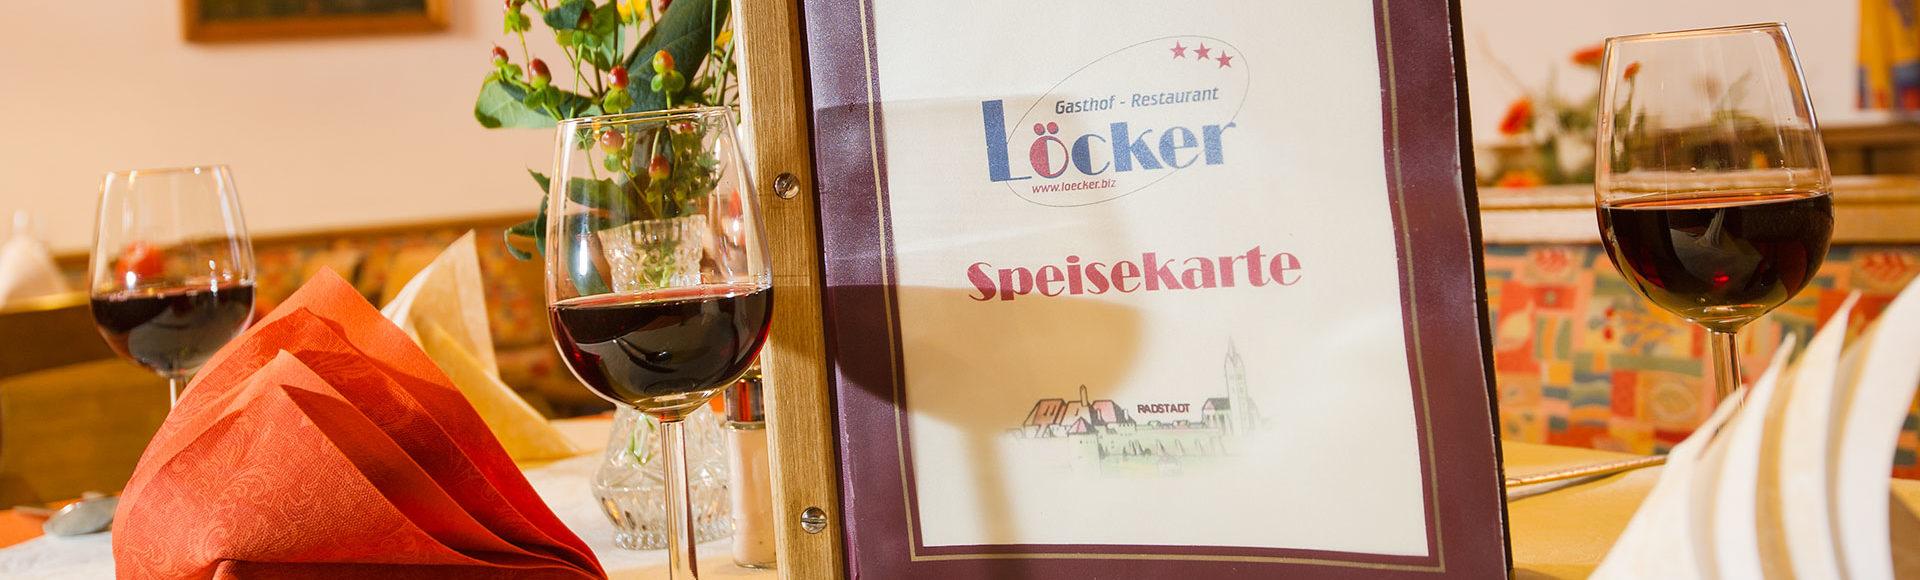 Speisekarte, Gasthof Löcker, Restaurant in Radstadt